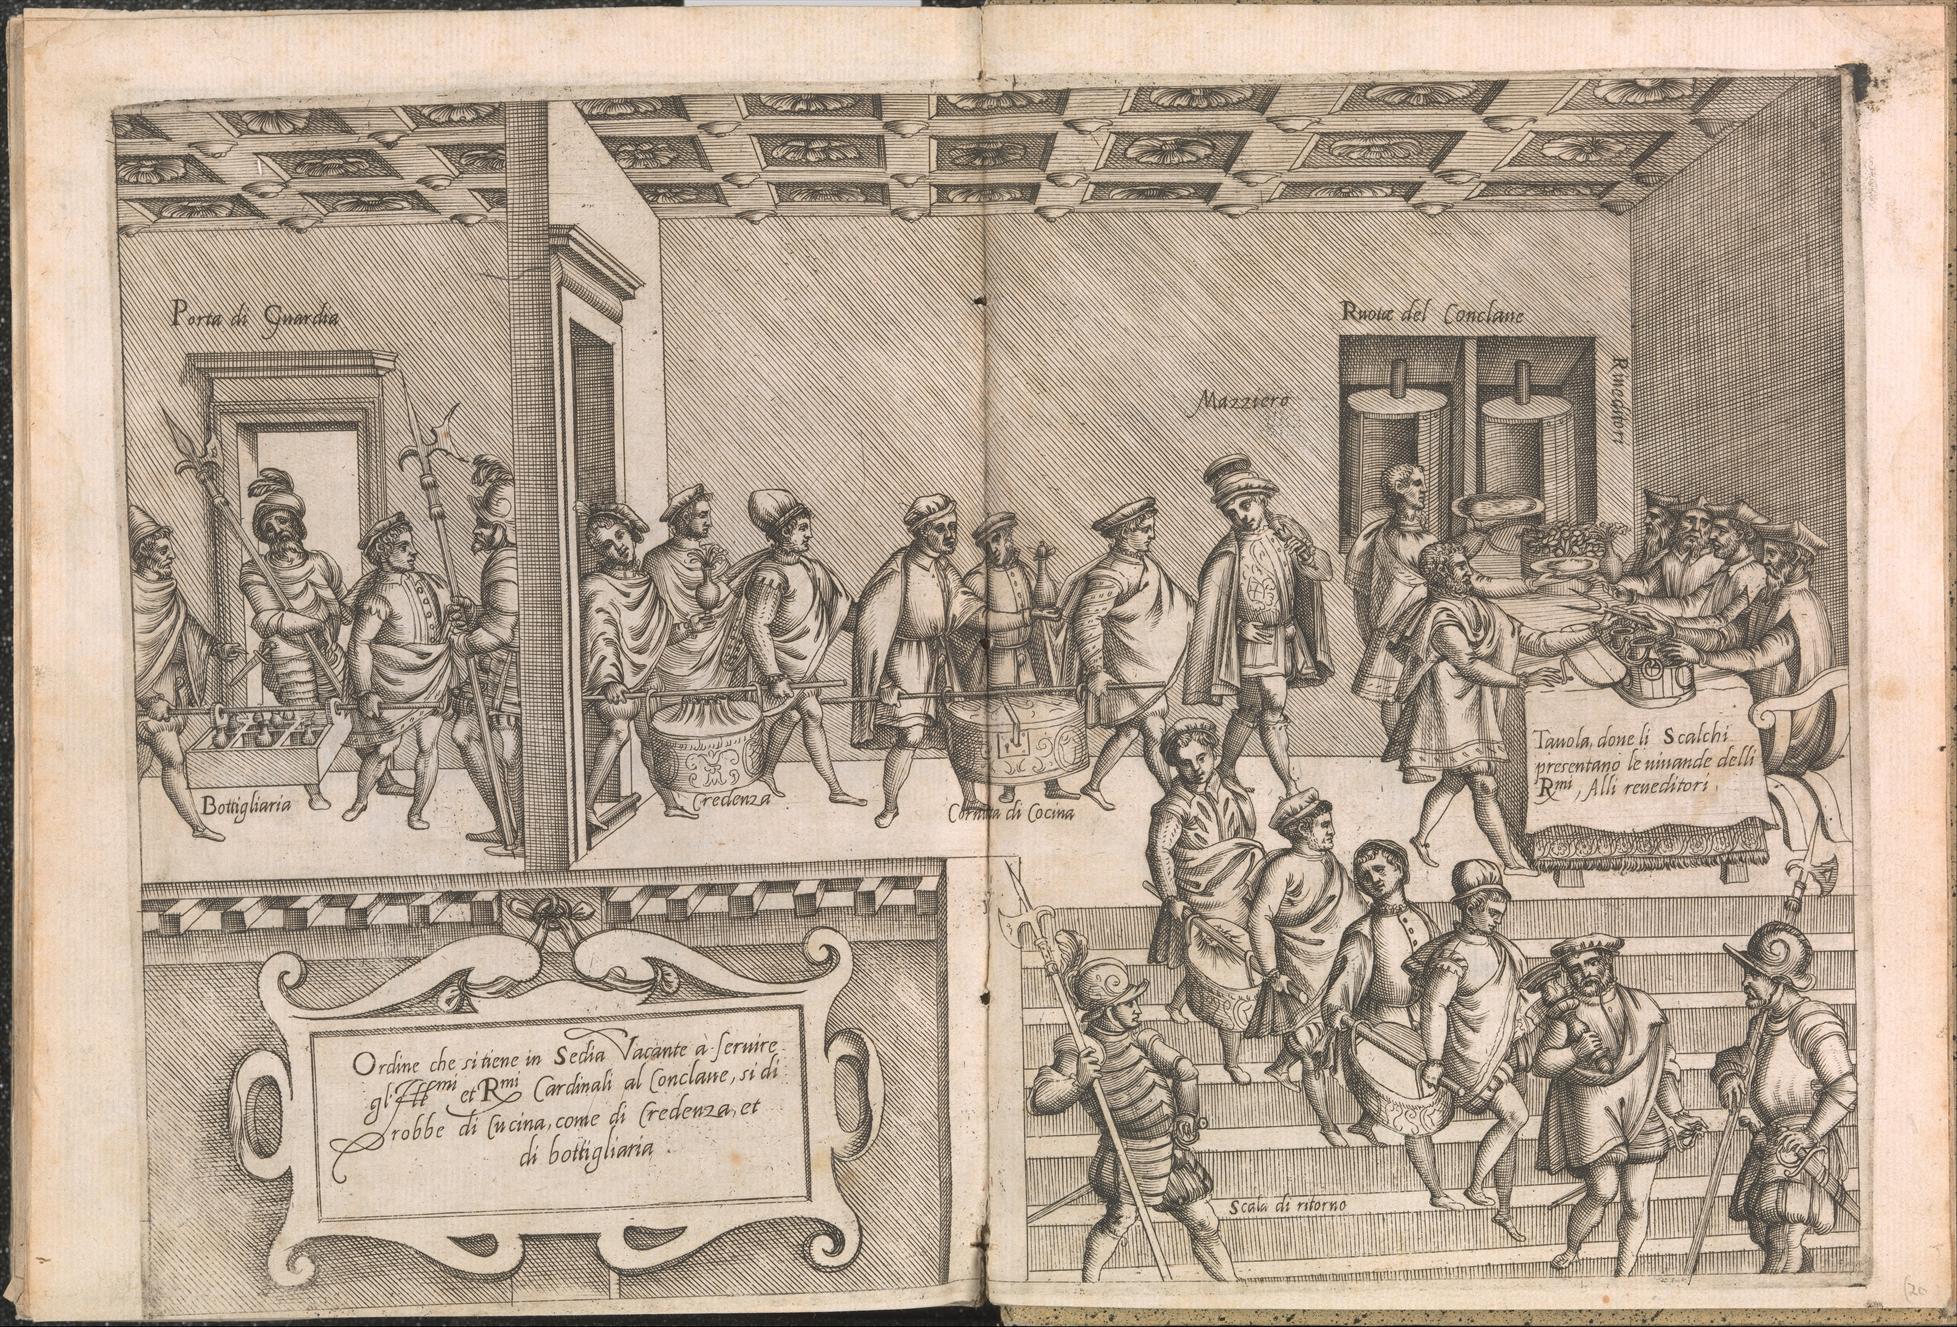 Prent uit Opera van Bartolomeo Scappi. Metropolitan Museum of Art